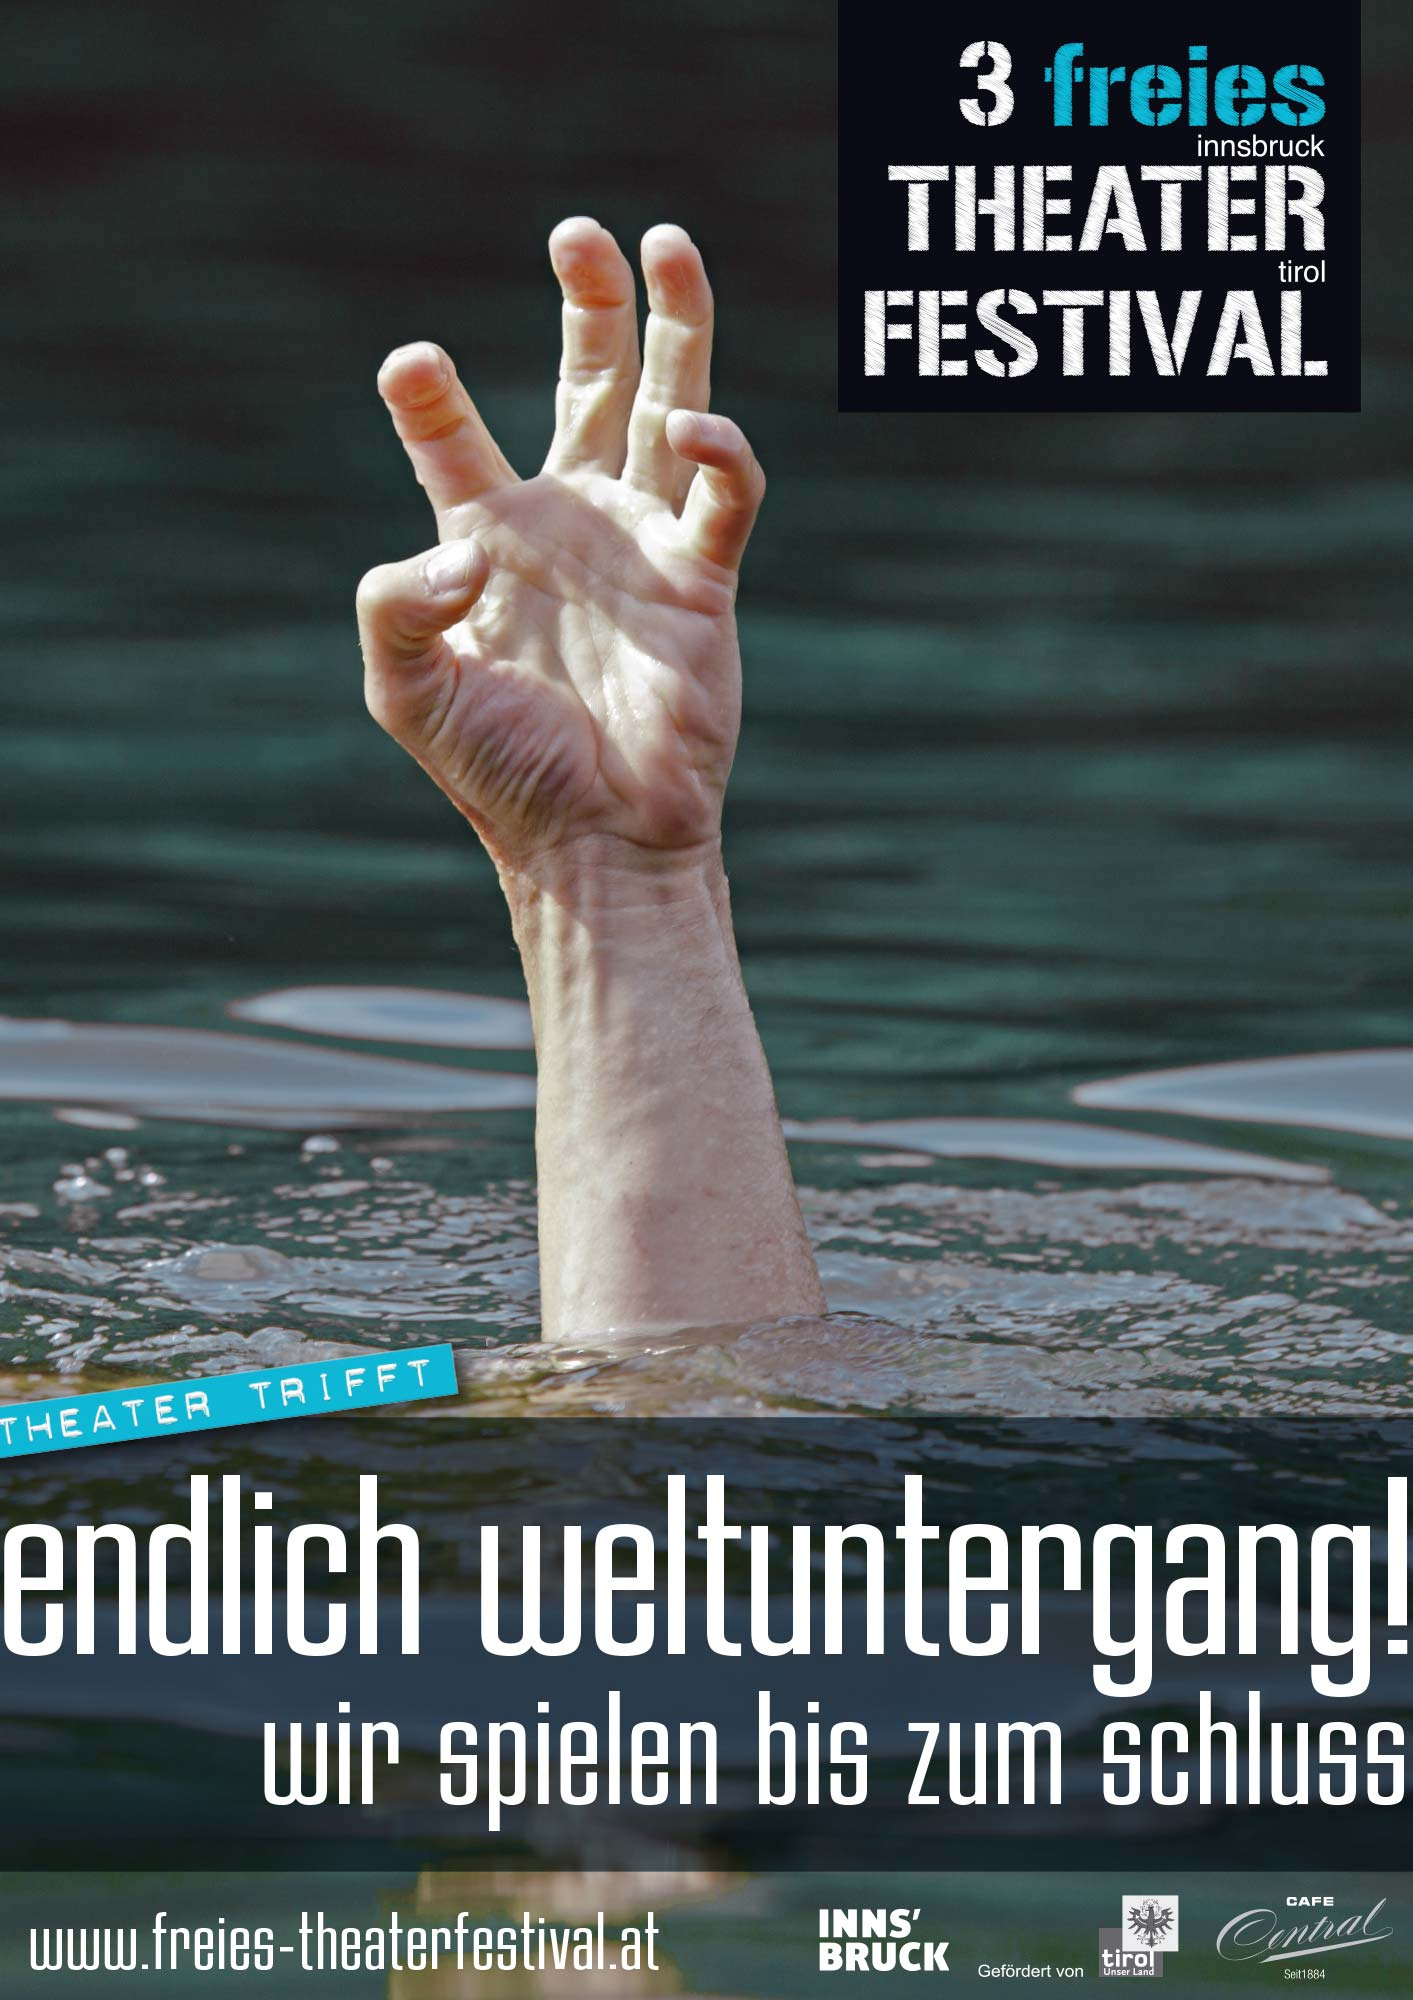 Theaterfestival 2012